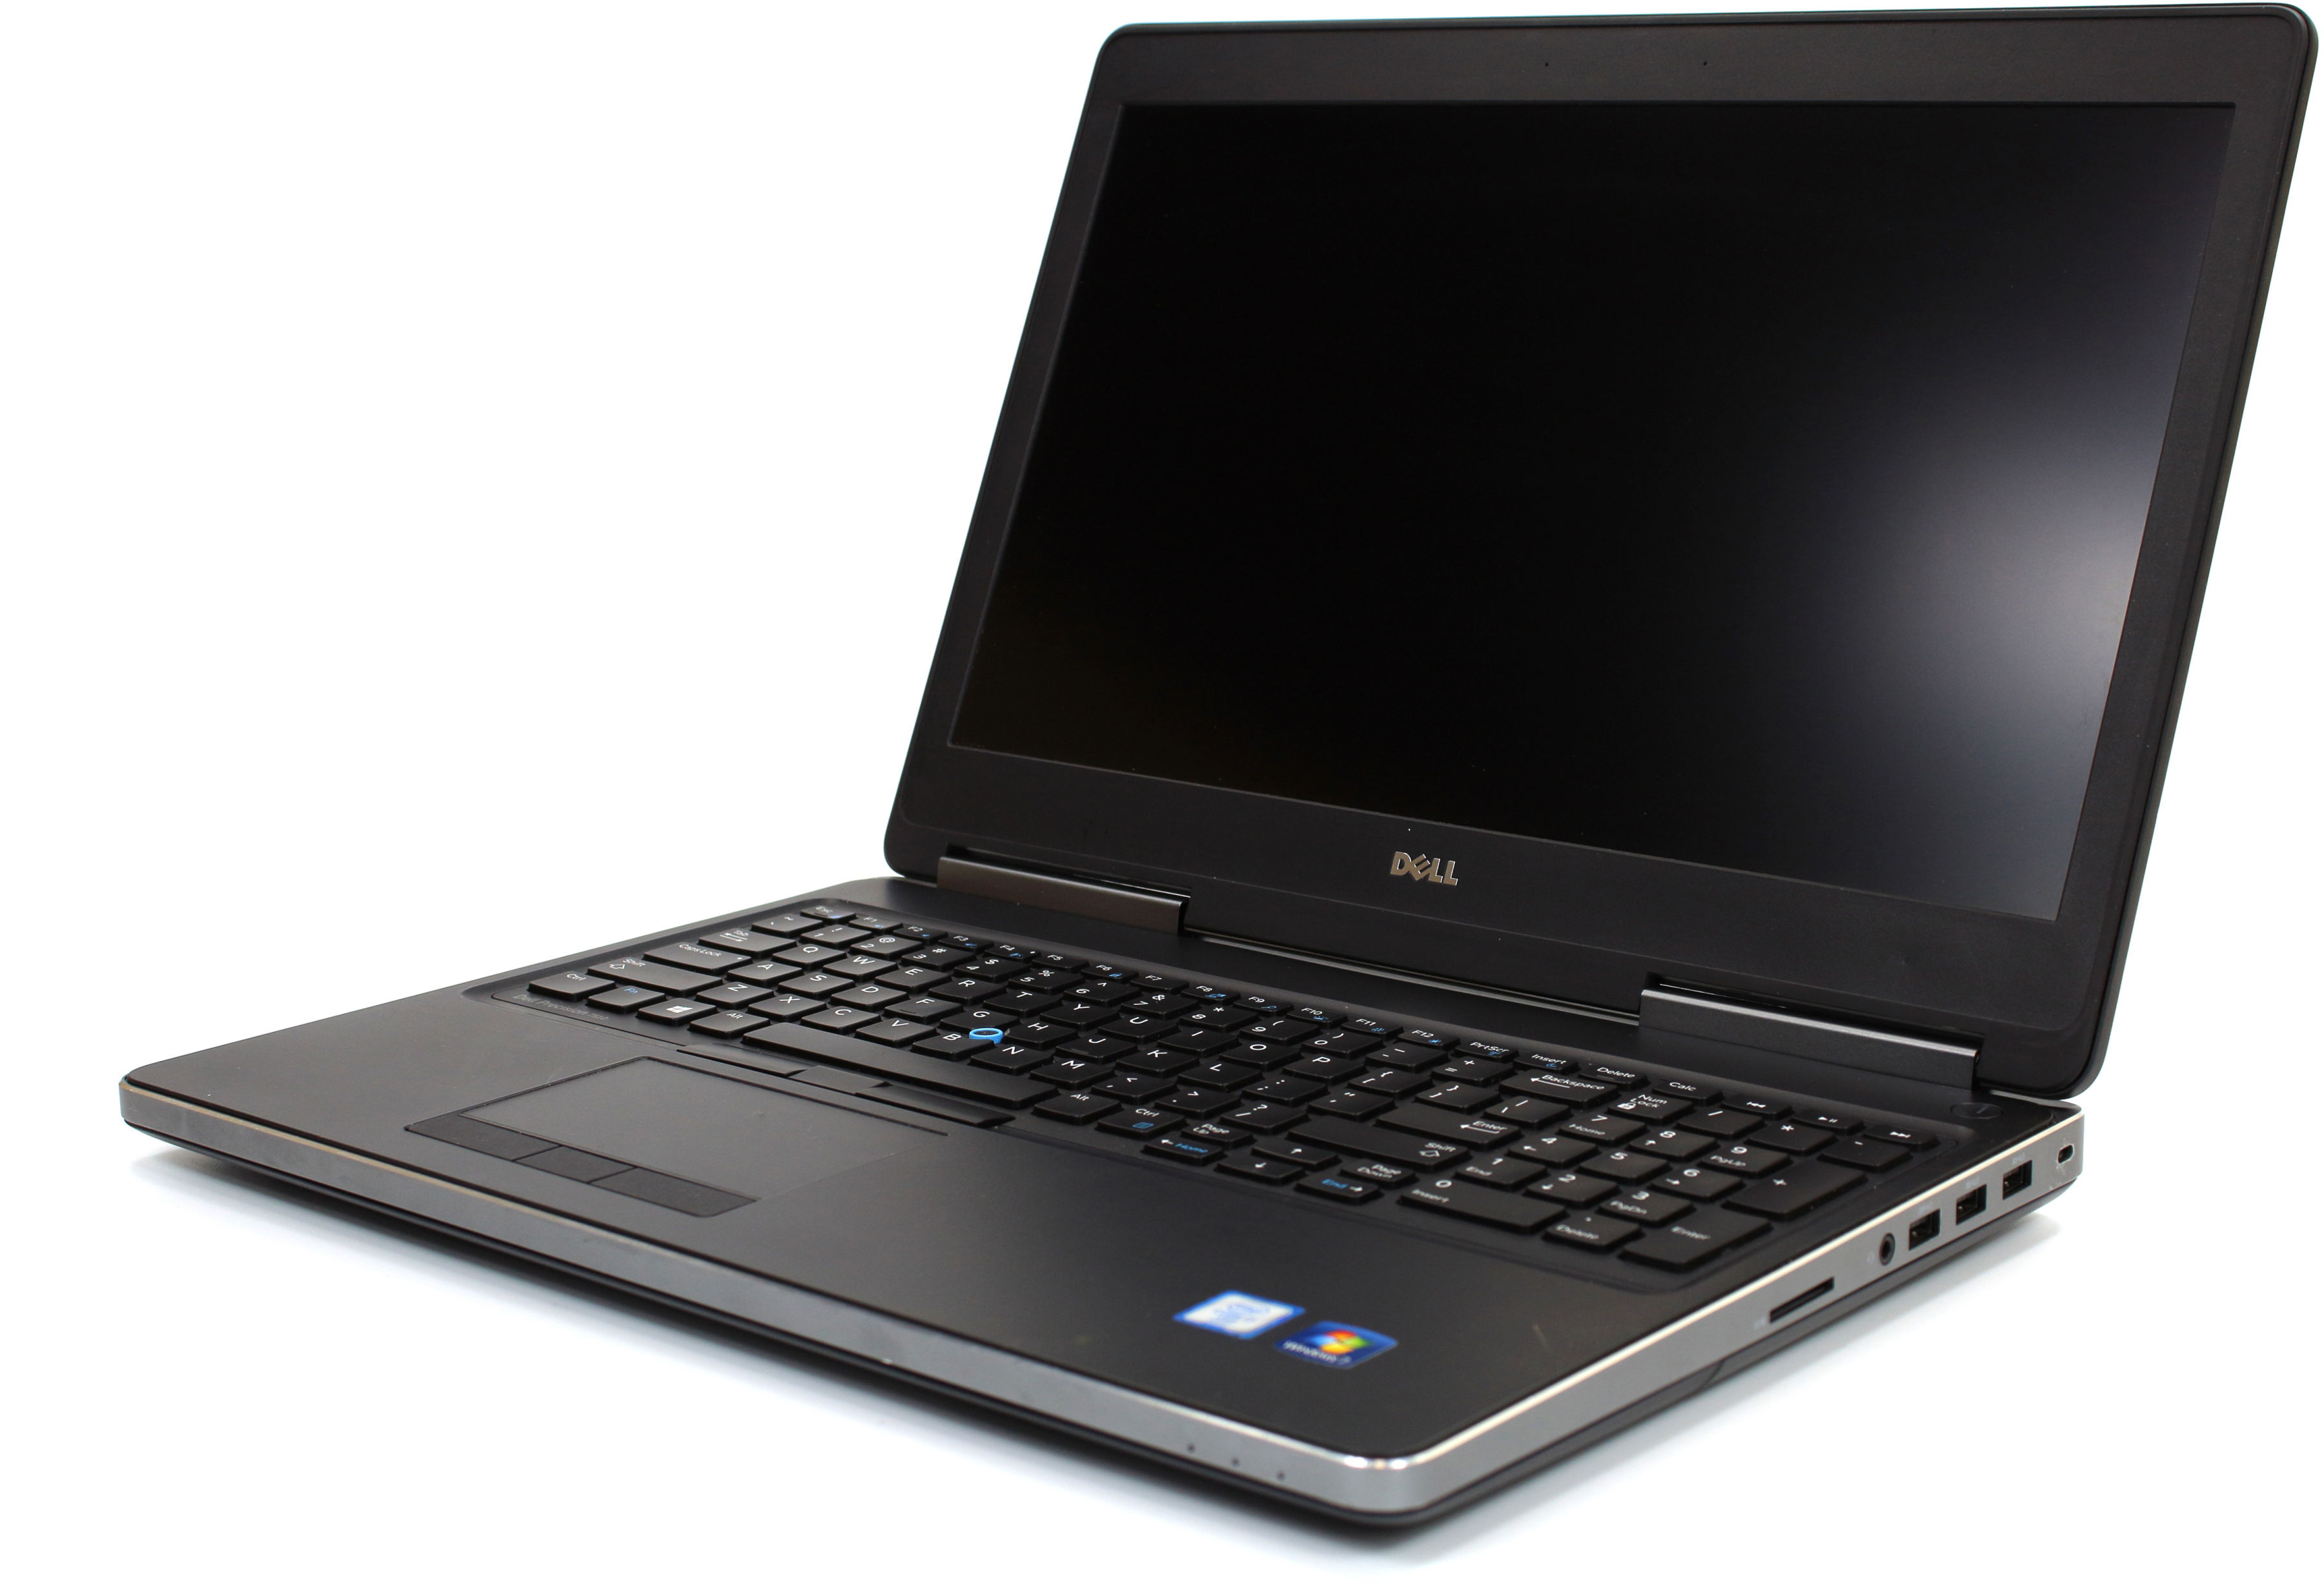 "DELL Precision 7510 15,6"" FHD IPS i7-6820HQ 32GB 512GB SSD nVidia M1000M - Windows 7/8/10 Pro (Klasa A-)"